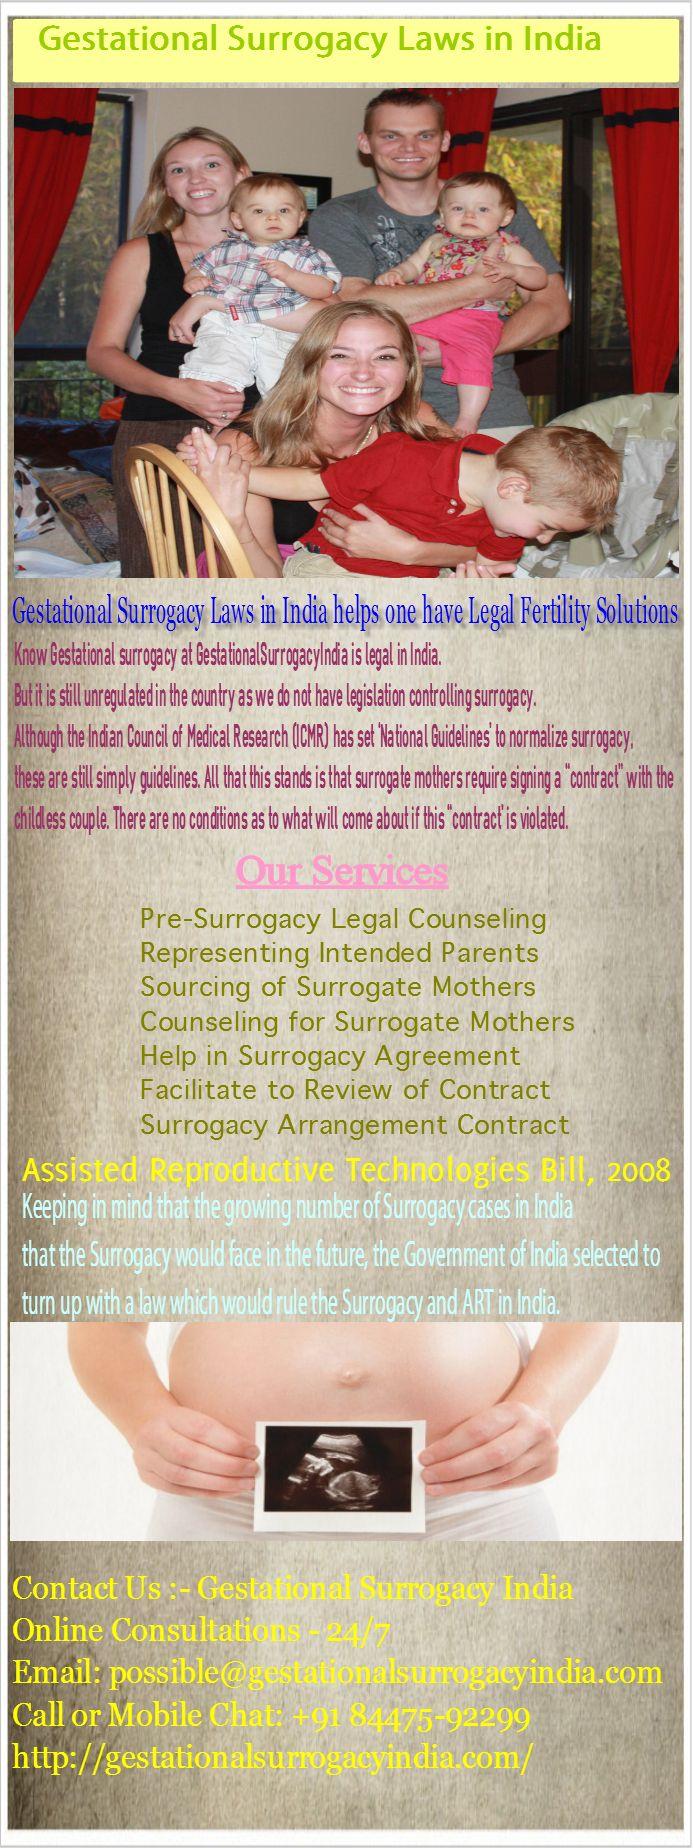 pro surrogacy essay Includes: basics of surrogate motherhood, pros & cons of surrogacy, and is surrogate motherhood legal.